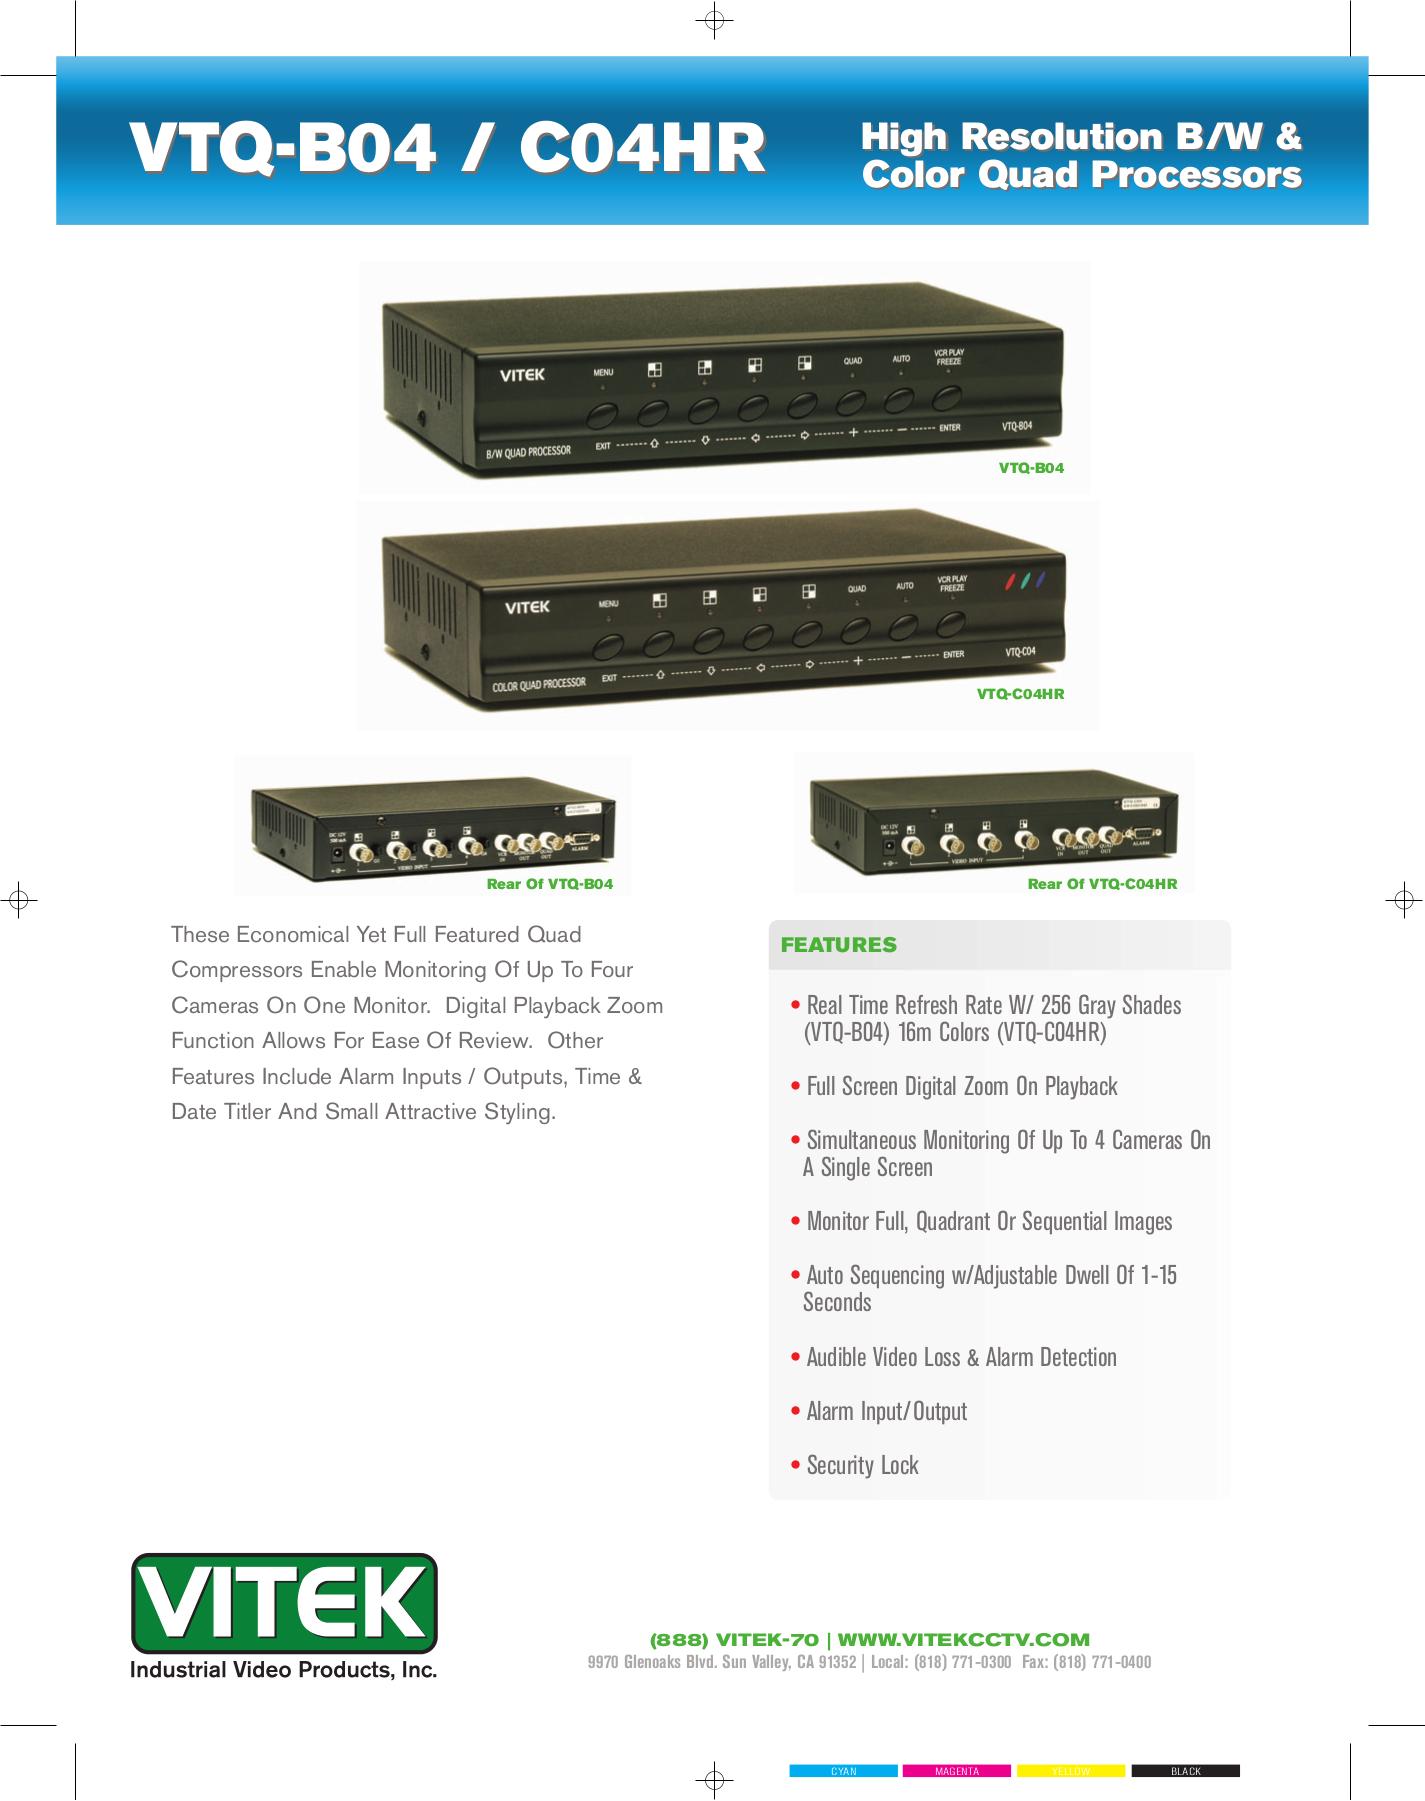 pdf for Vitek Other VTQ-B04 Processors manual